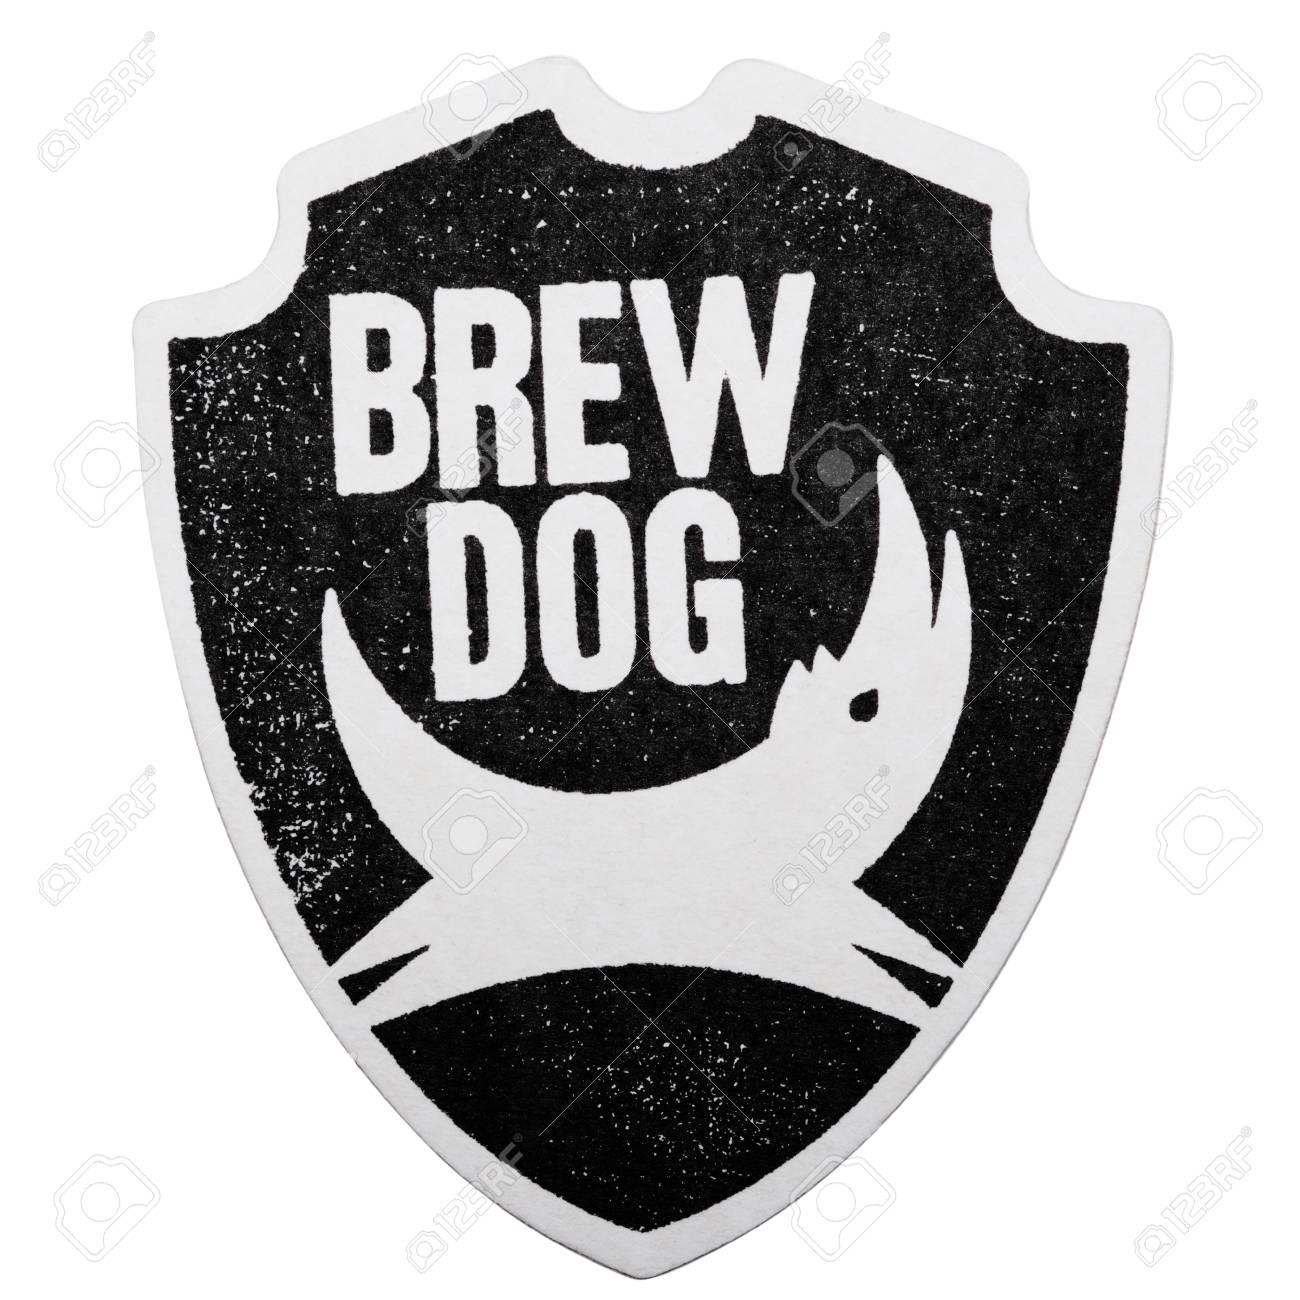 London Uk February 04 2018 Brewdog Craft Beer Original Beermat Stock Photo Picture And Royalty Free Image Image 98057978